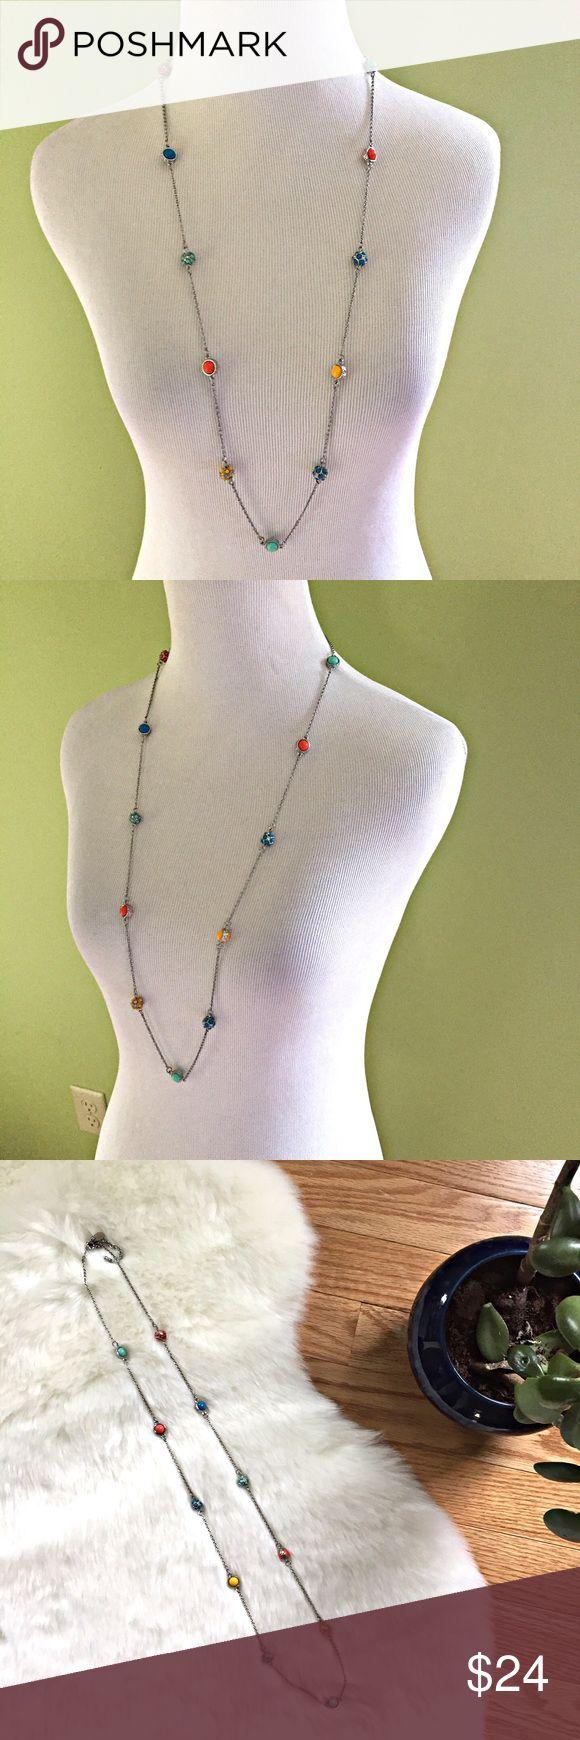 "Lia Sophia long beaded necklace Beautiful long beaded necklace from Lia Sophia. Adjustable length 35.5"" - 38.5"". Lobster clasp. EUC Lia Sophia Jewelry Necklaces"